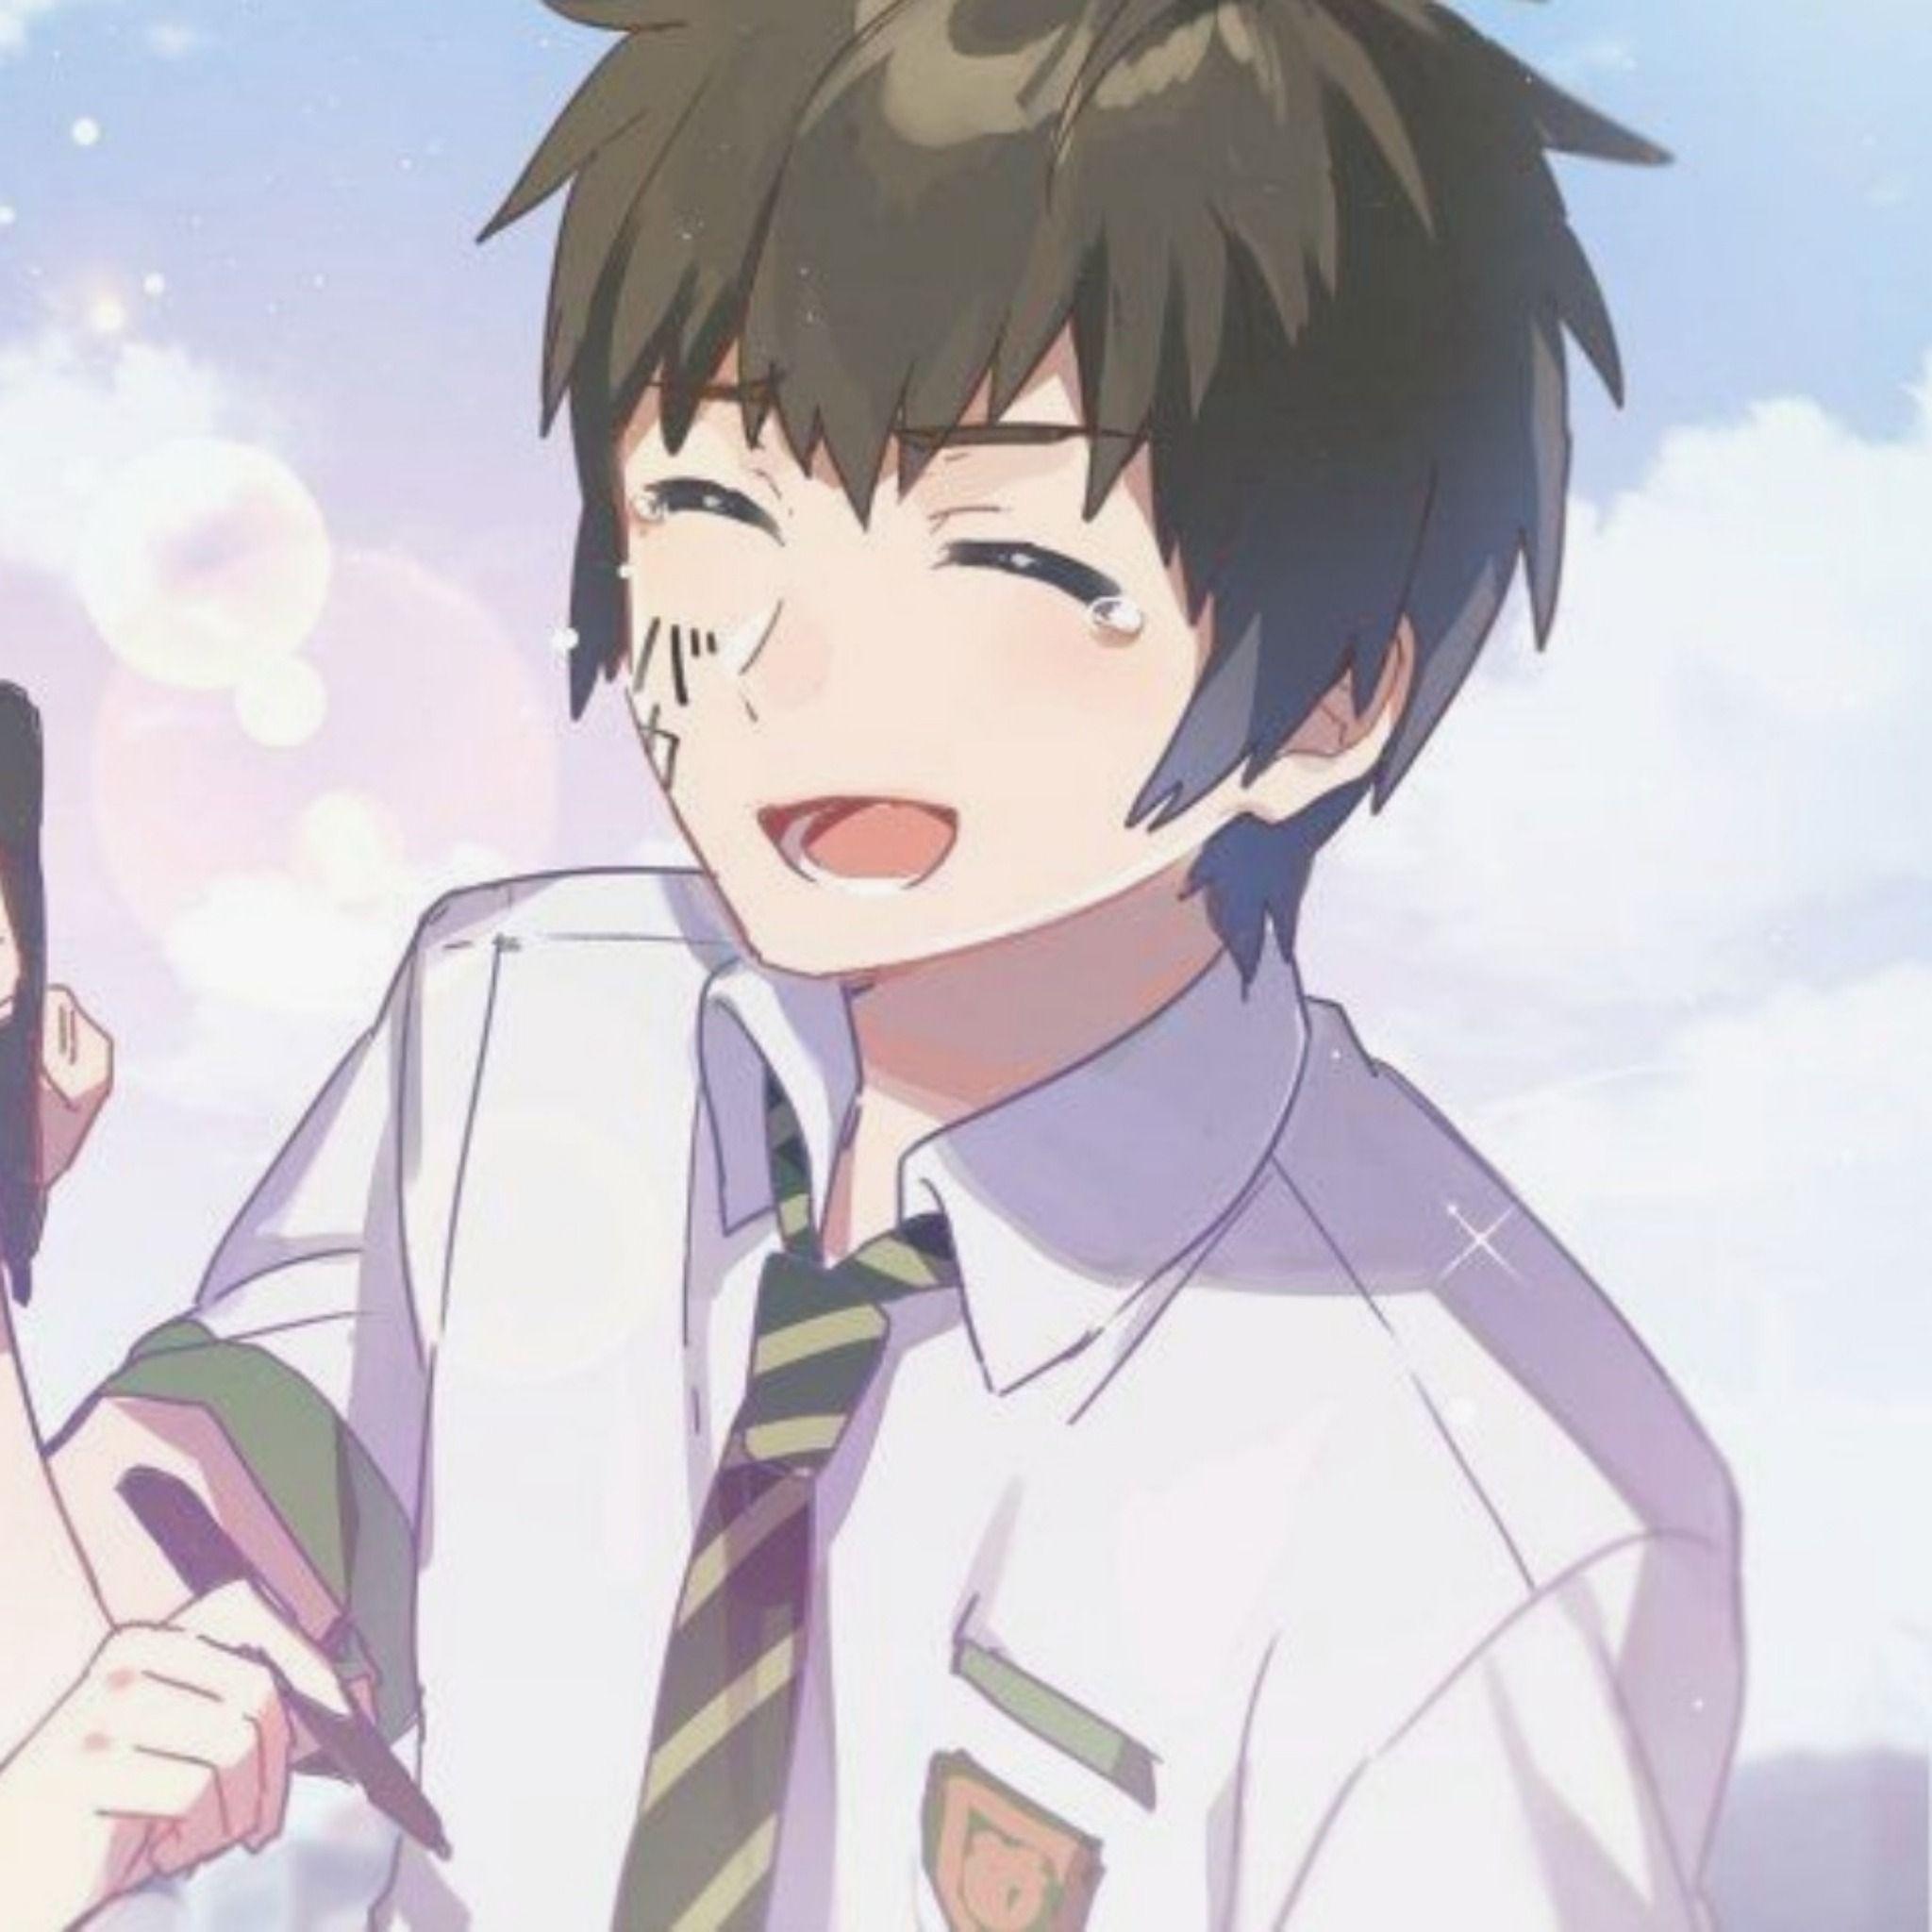 Anime Couple Terpisah Anime Profil Wa Aesthetic Novocom Top